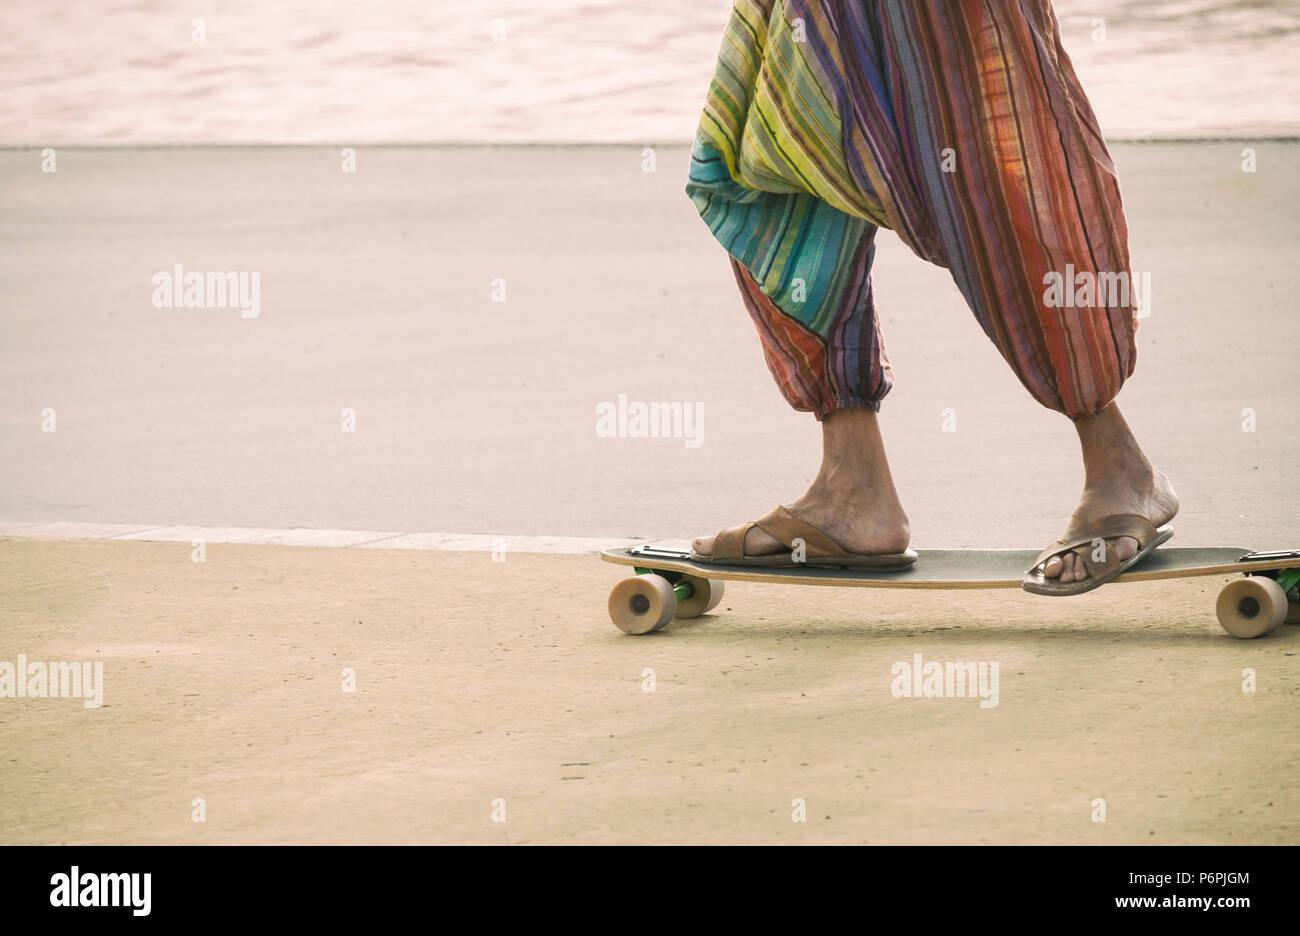 Hippy riding a skateboard wearing Flip Flops/sandals. - Stock Image